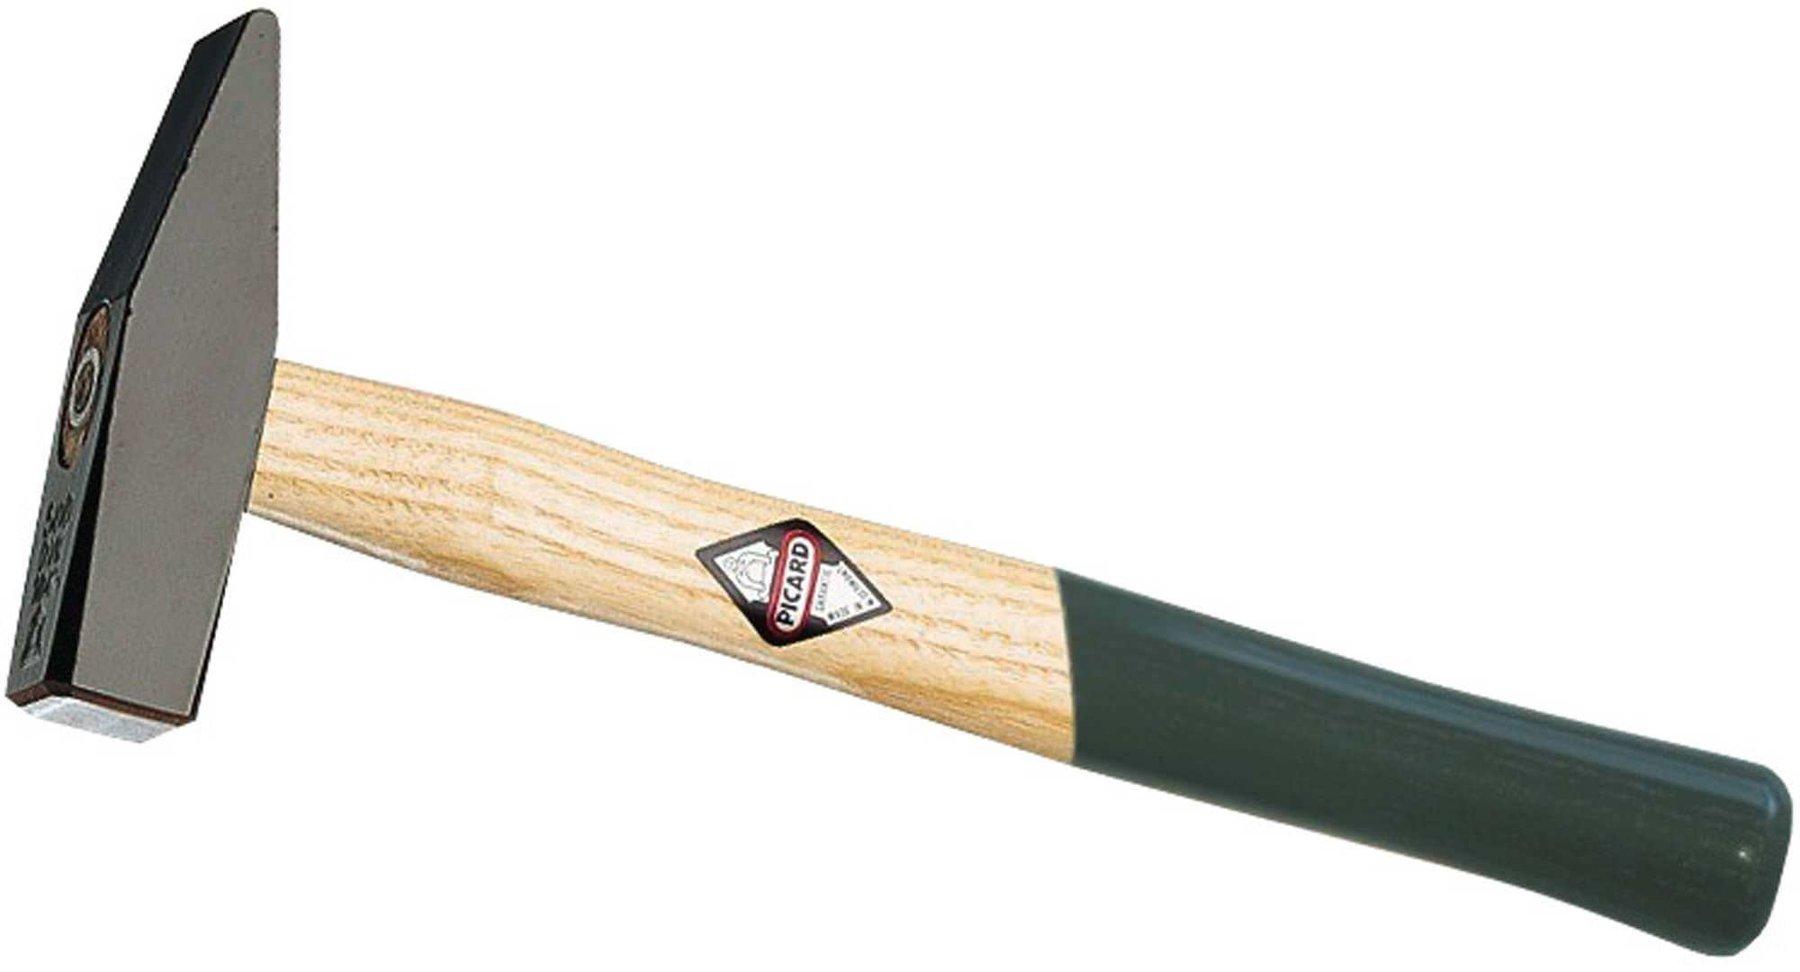 Schlosserhammer 100 Gramm Hammer Fiberglasstiel Schlosserhämmer Schlagwerkzeug